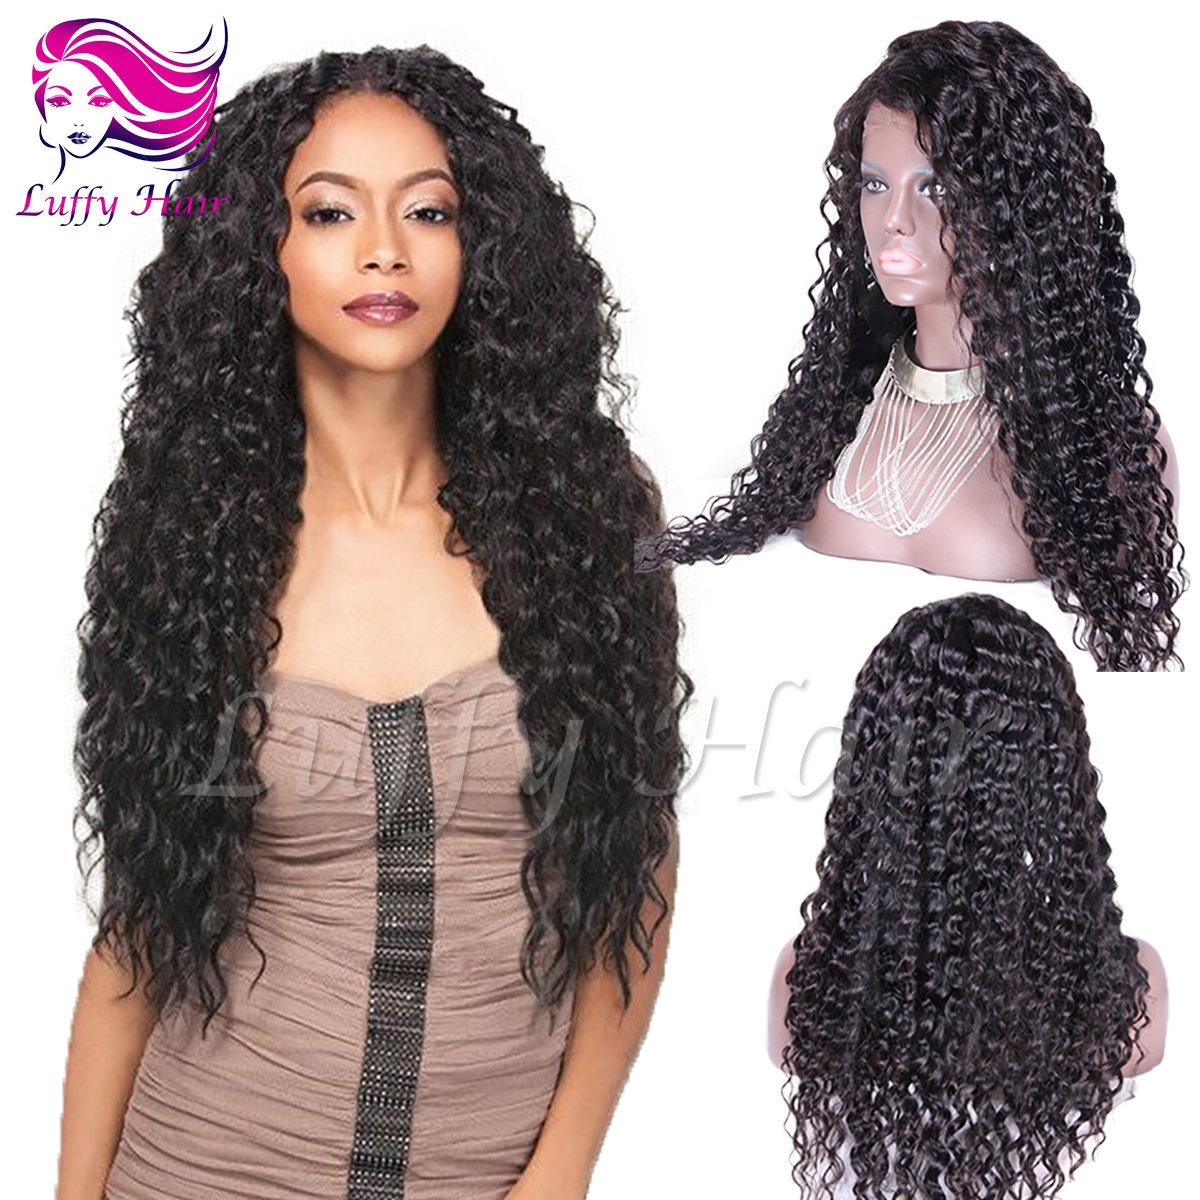 8A Virgin Human Hair Curly Wig - KWL035